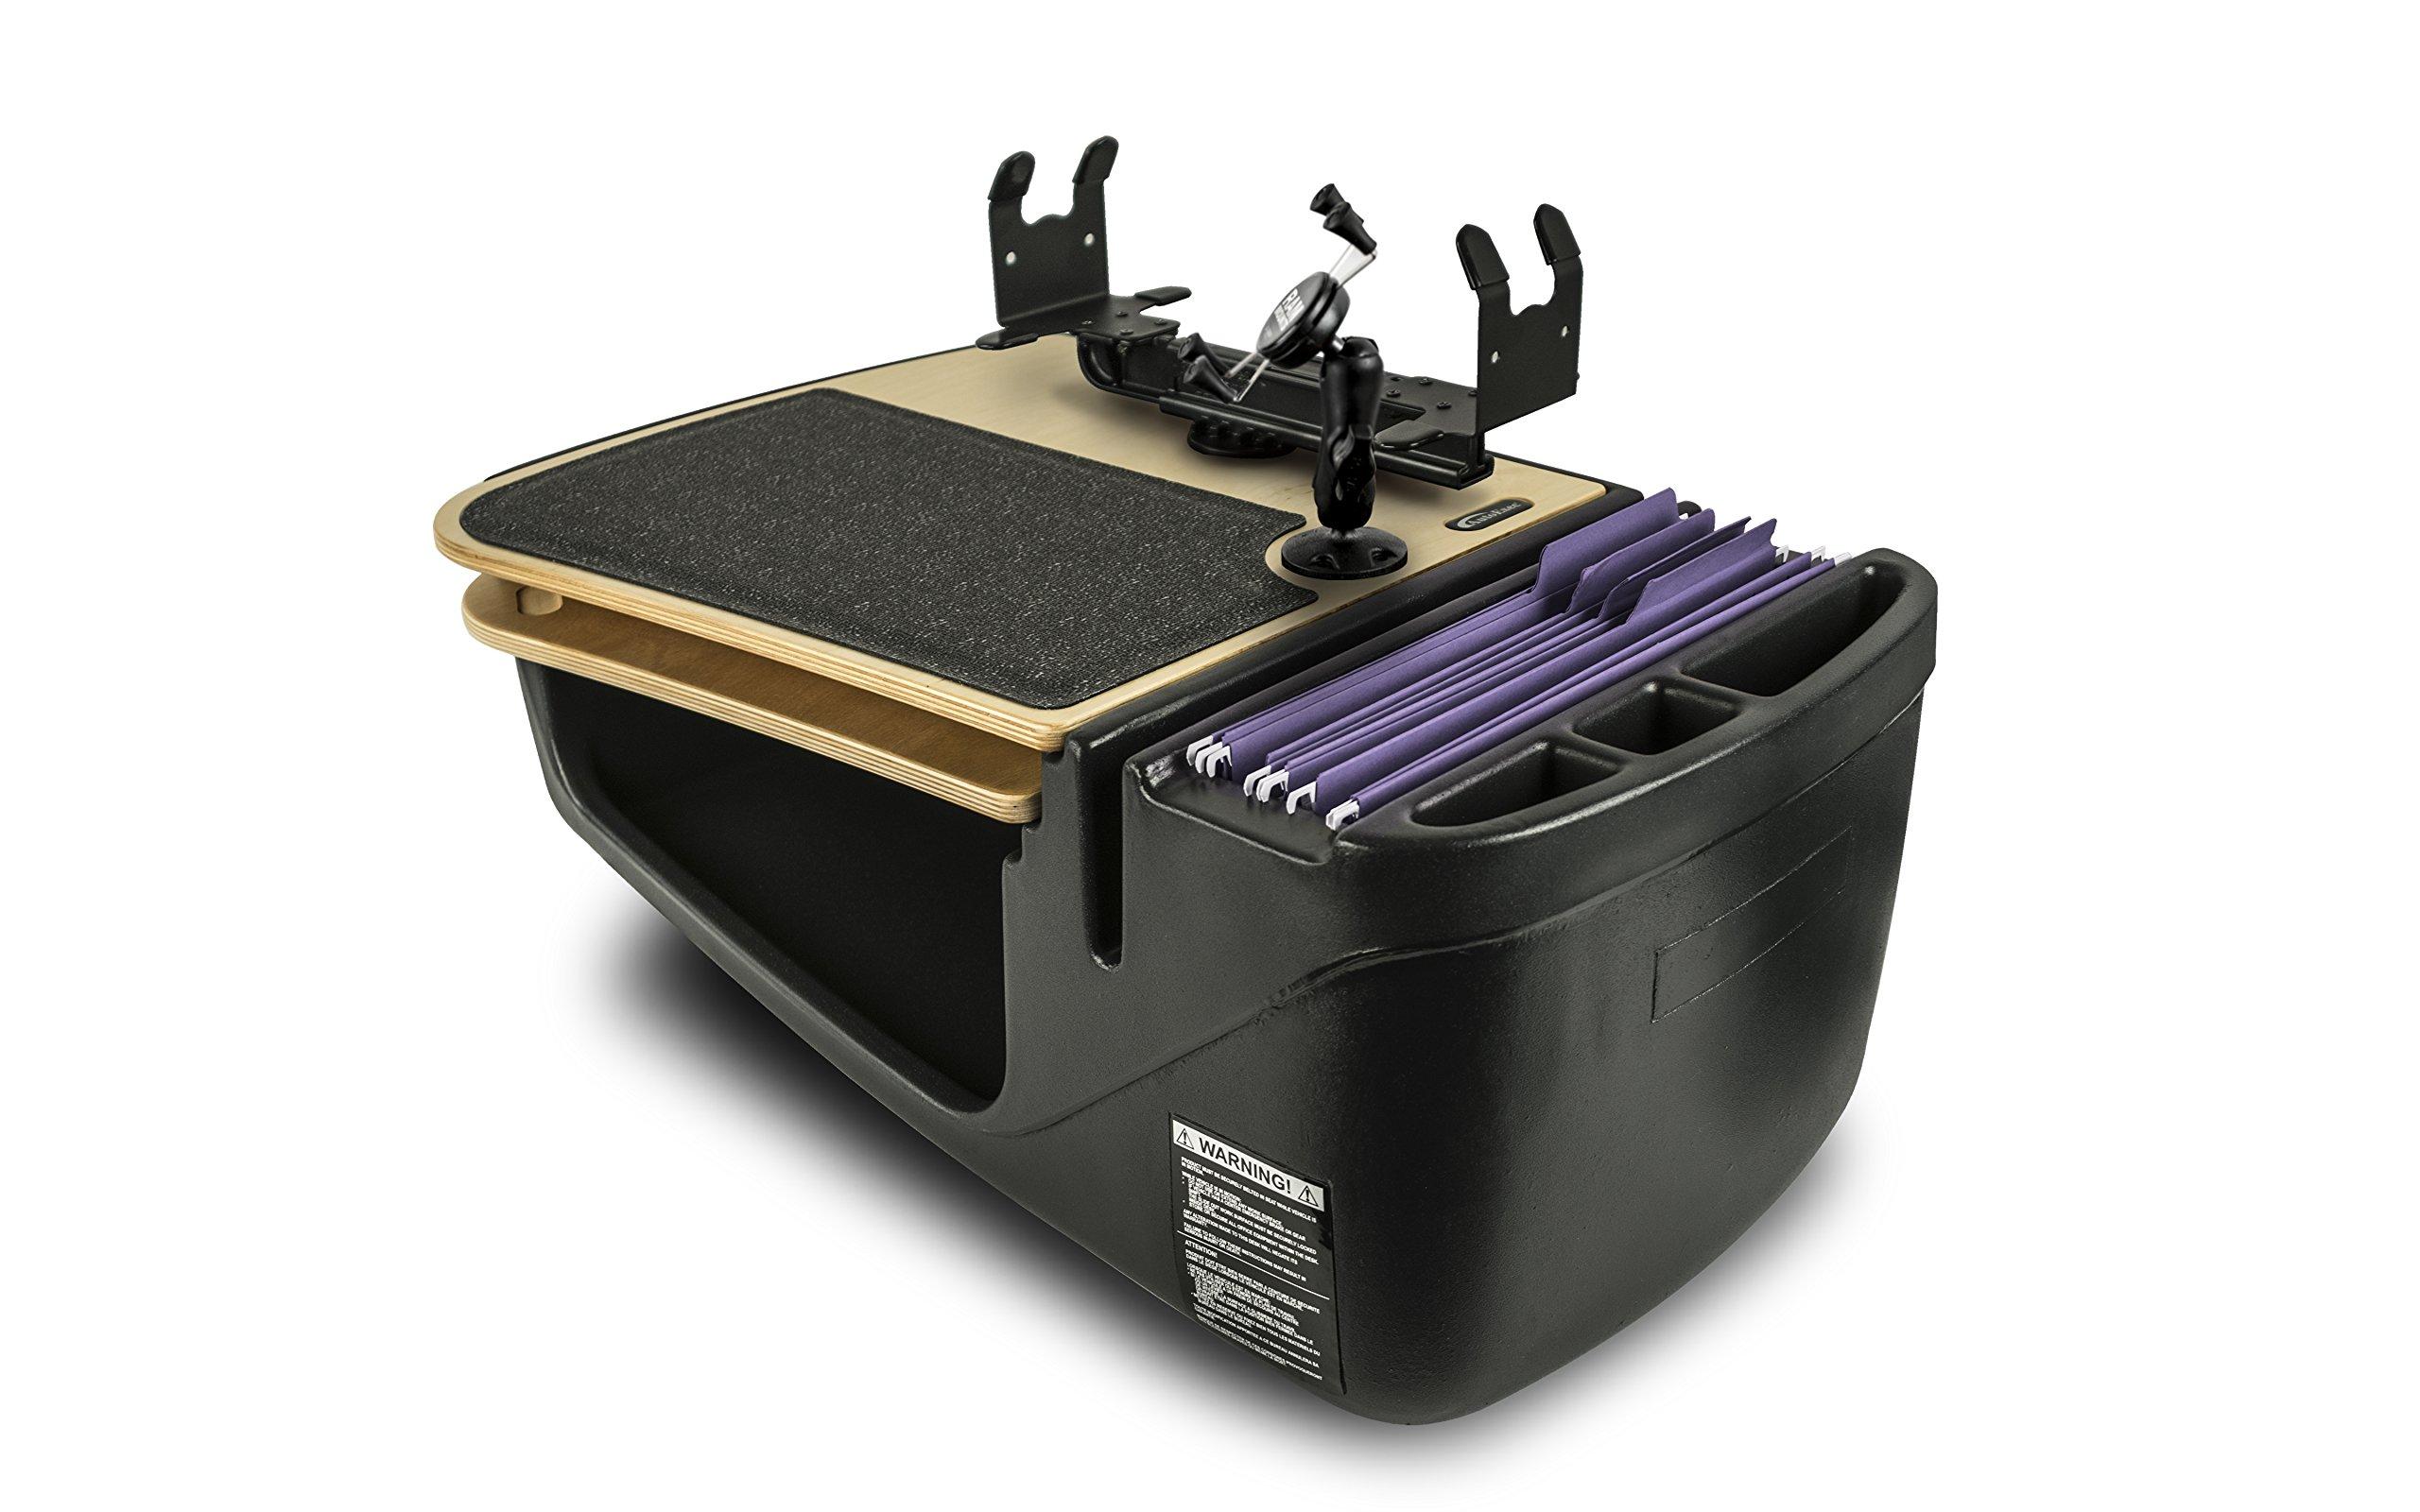 AutoExec AUE18250 GripMaster Car Desk (Birch Elite with Built-in Power Inverter, X-Grip Phone Mount and Printer Stand)